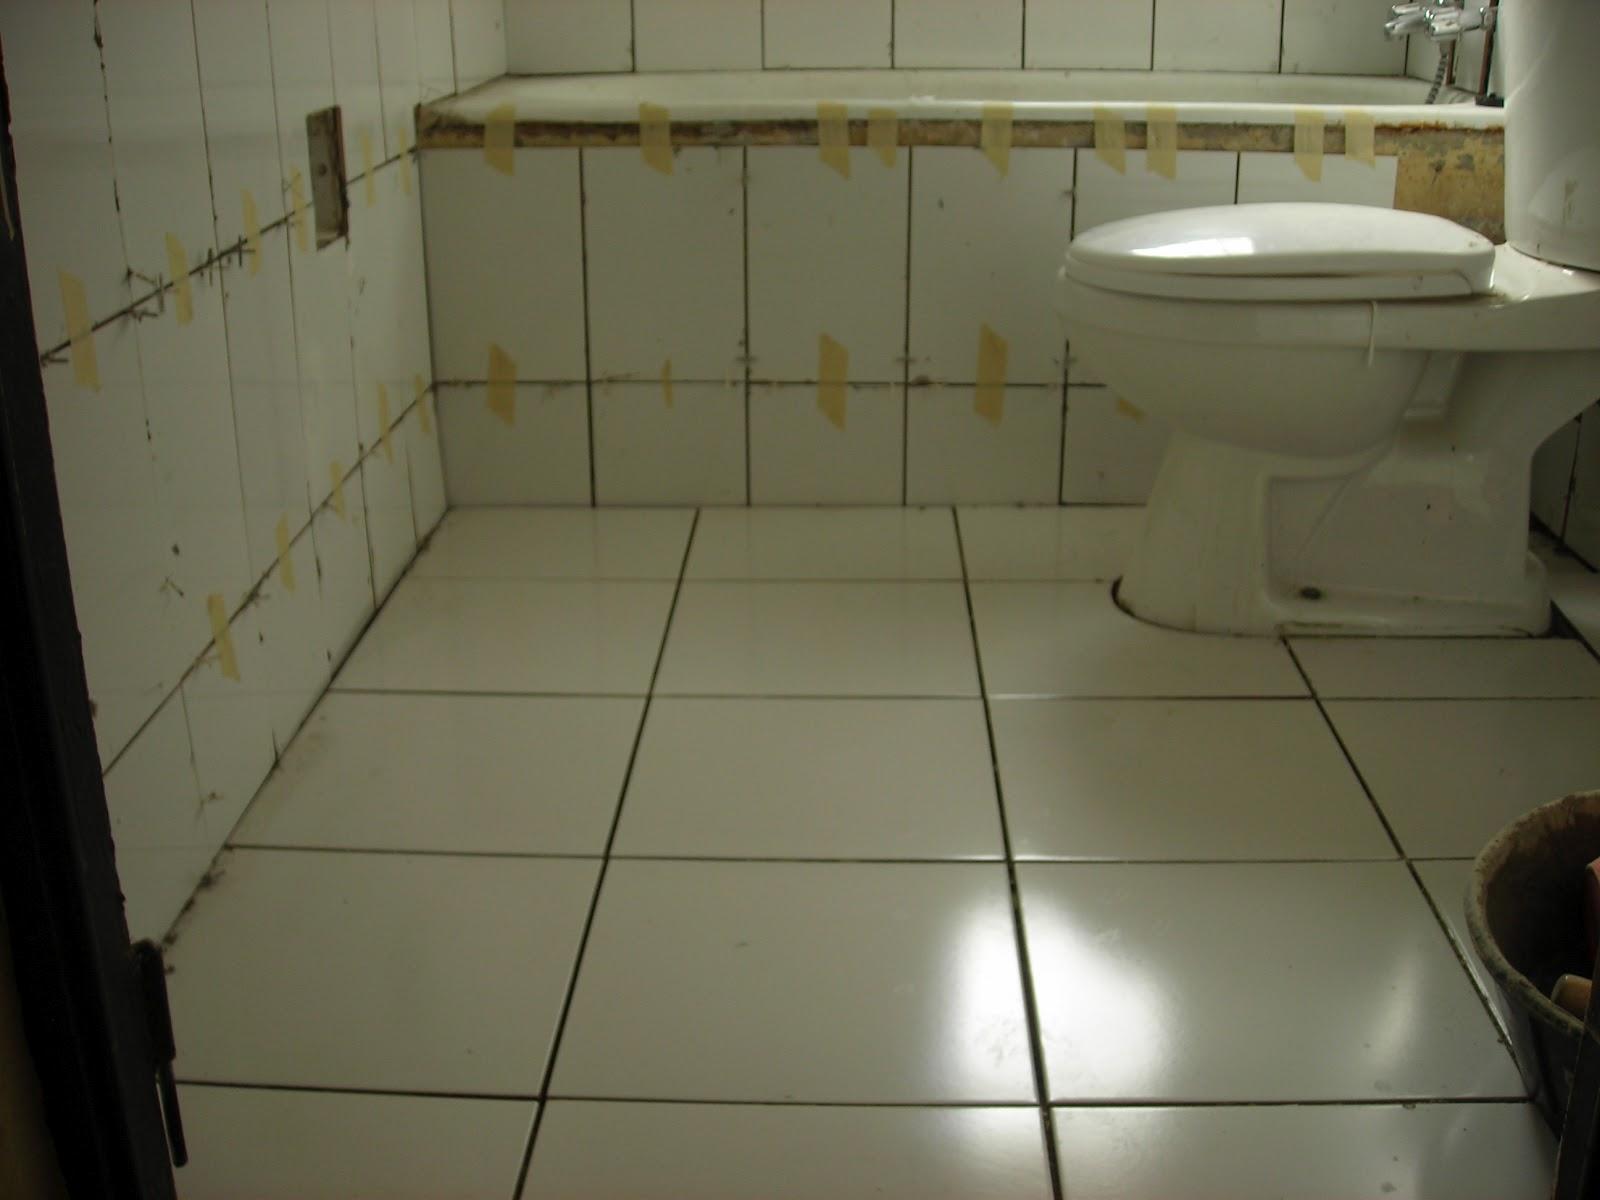 Dise os y muebles por raul vargas ch ceramicas ba o for Ofertas de ceramicas para piso